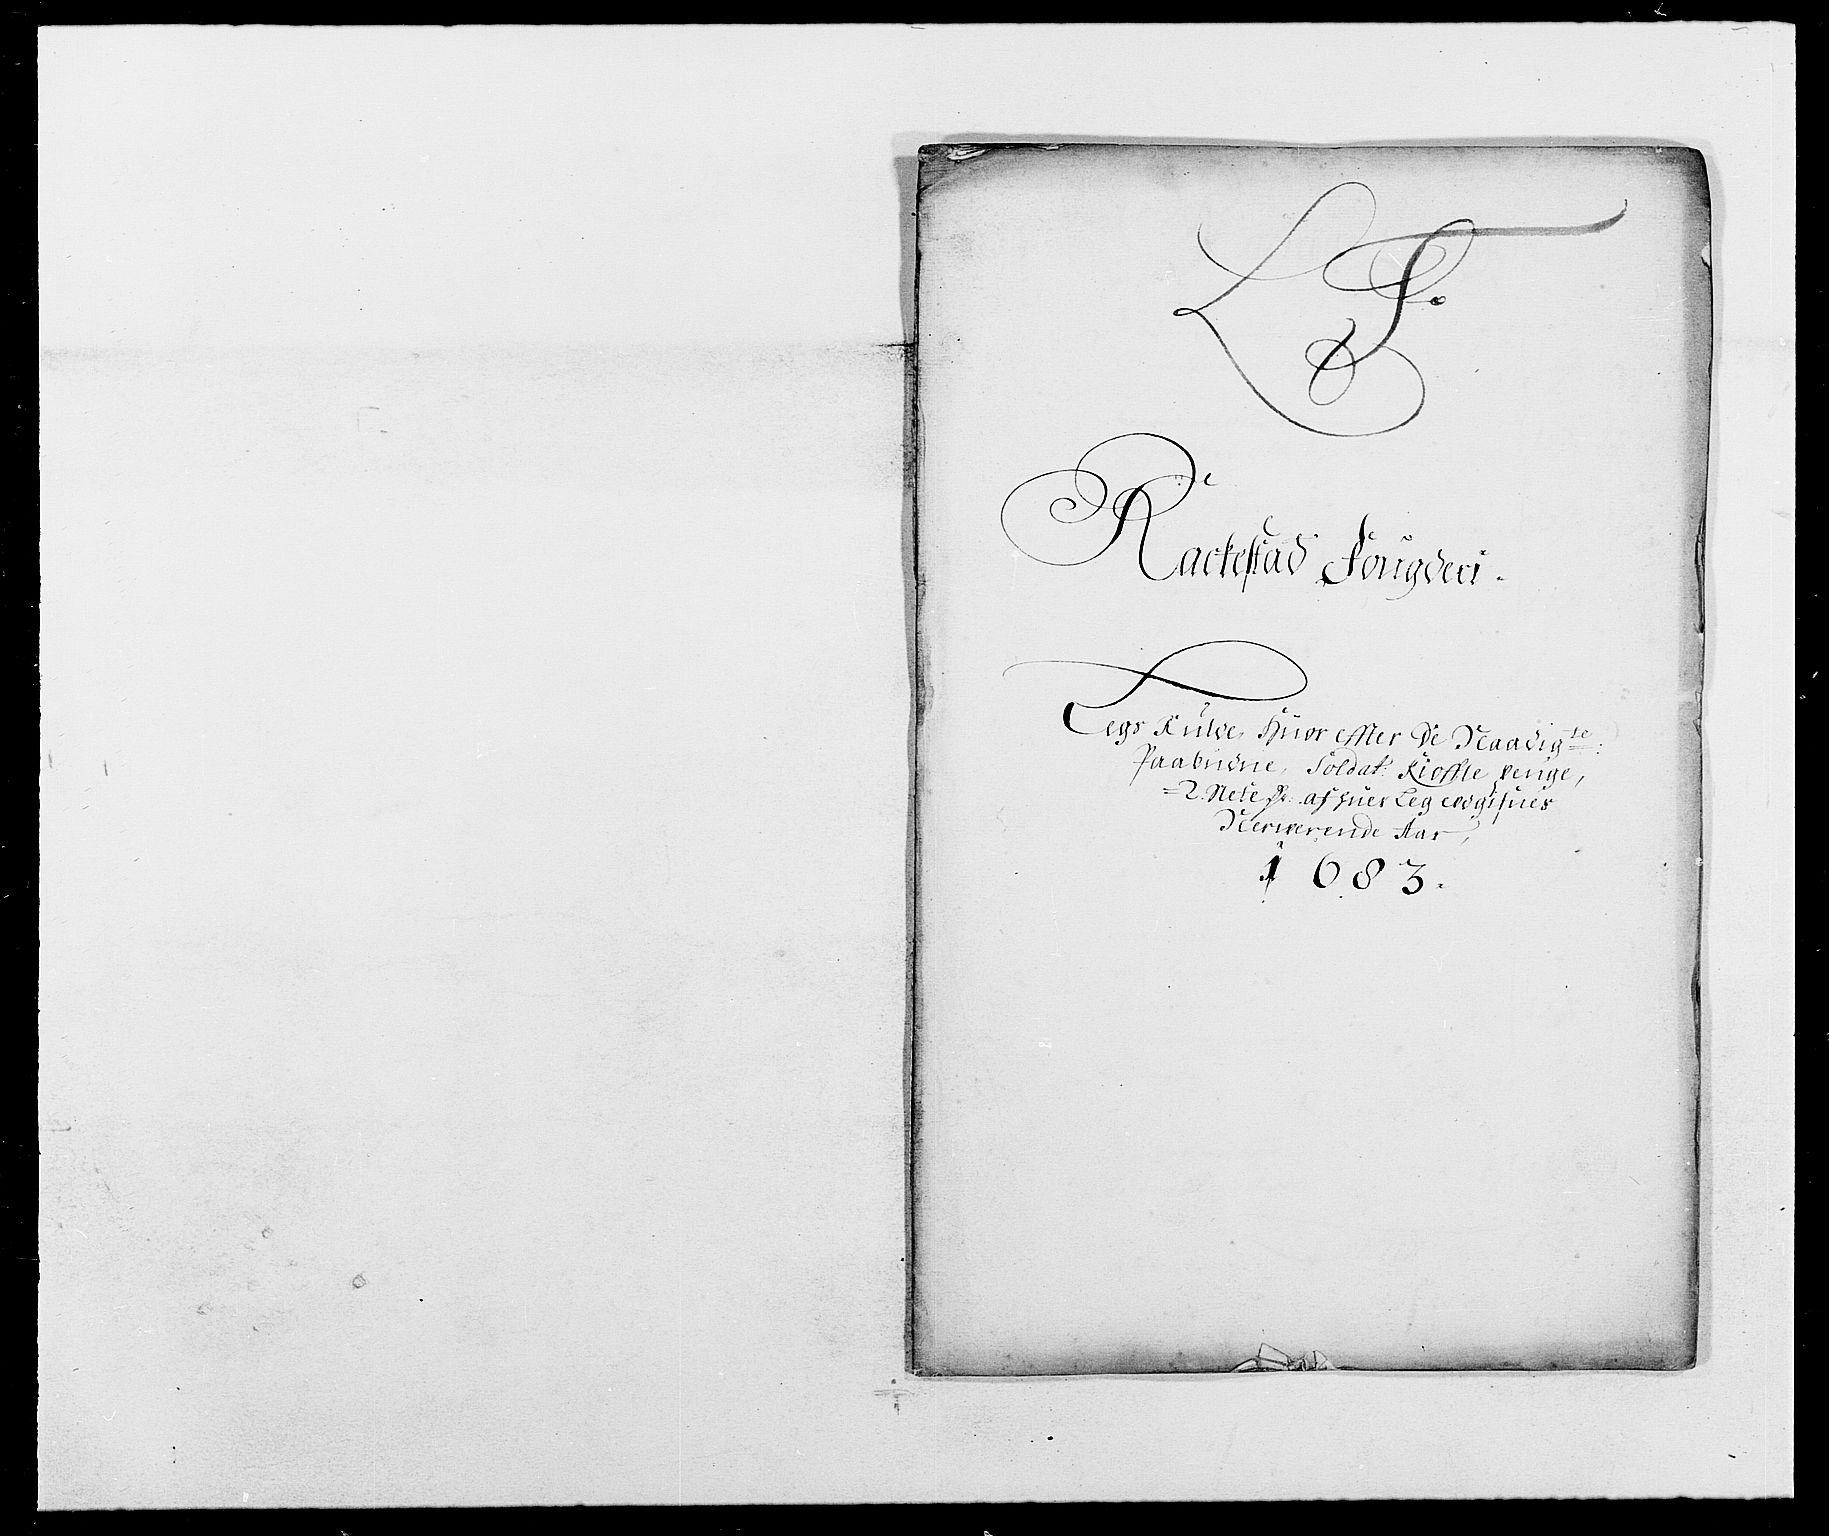 RA, Rentekammeret inntil 1814, Reviderte regnskaper, Fogderegnskap, R05/L0274: Fogderegnskap Rakkestad, 1683-1684, s. 148